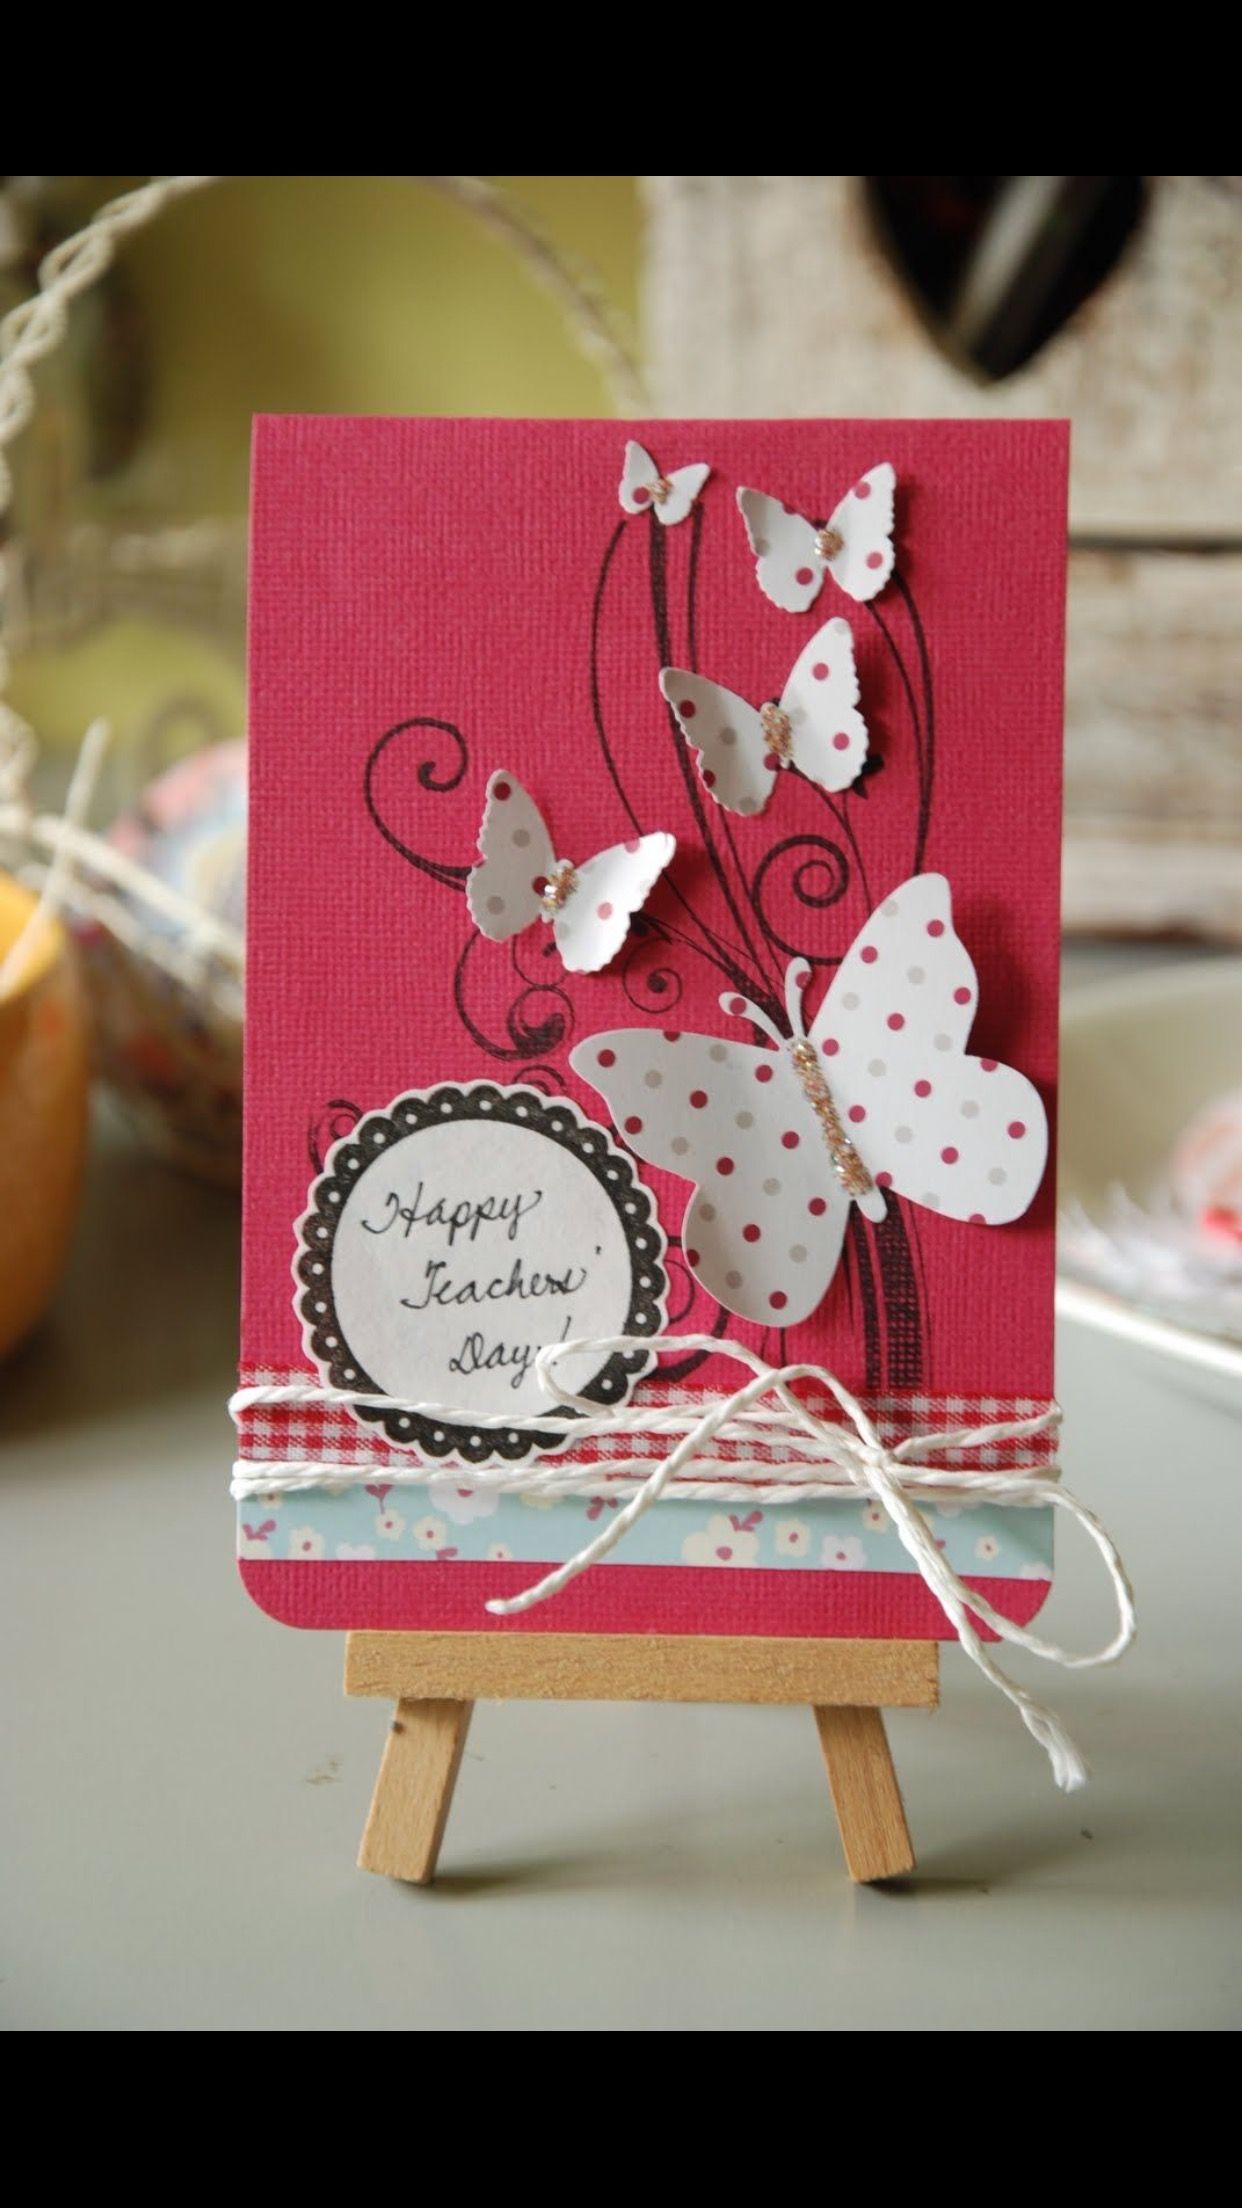 Pin by ÅśhÜ❤️ on Creative  Teachers day greeting card, Handmade